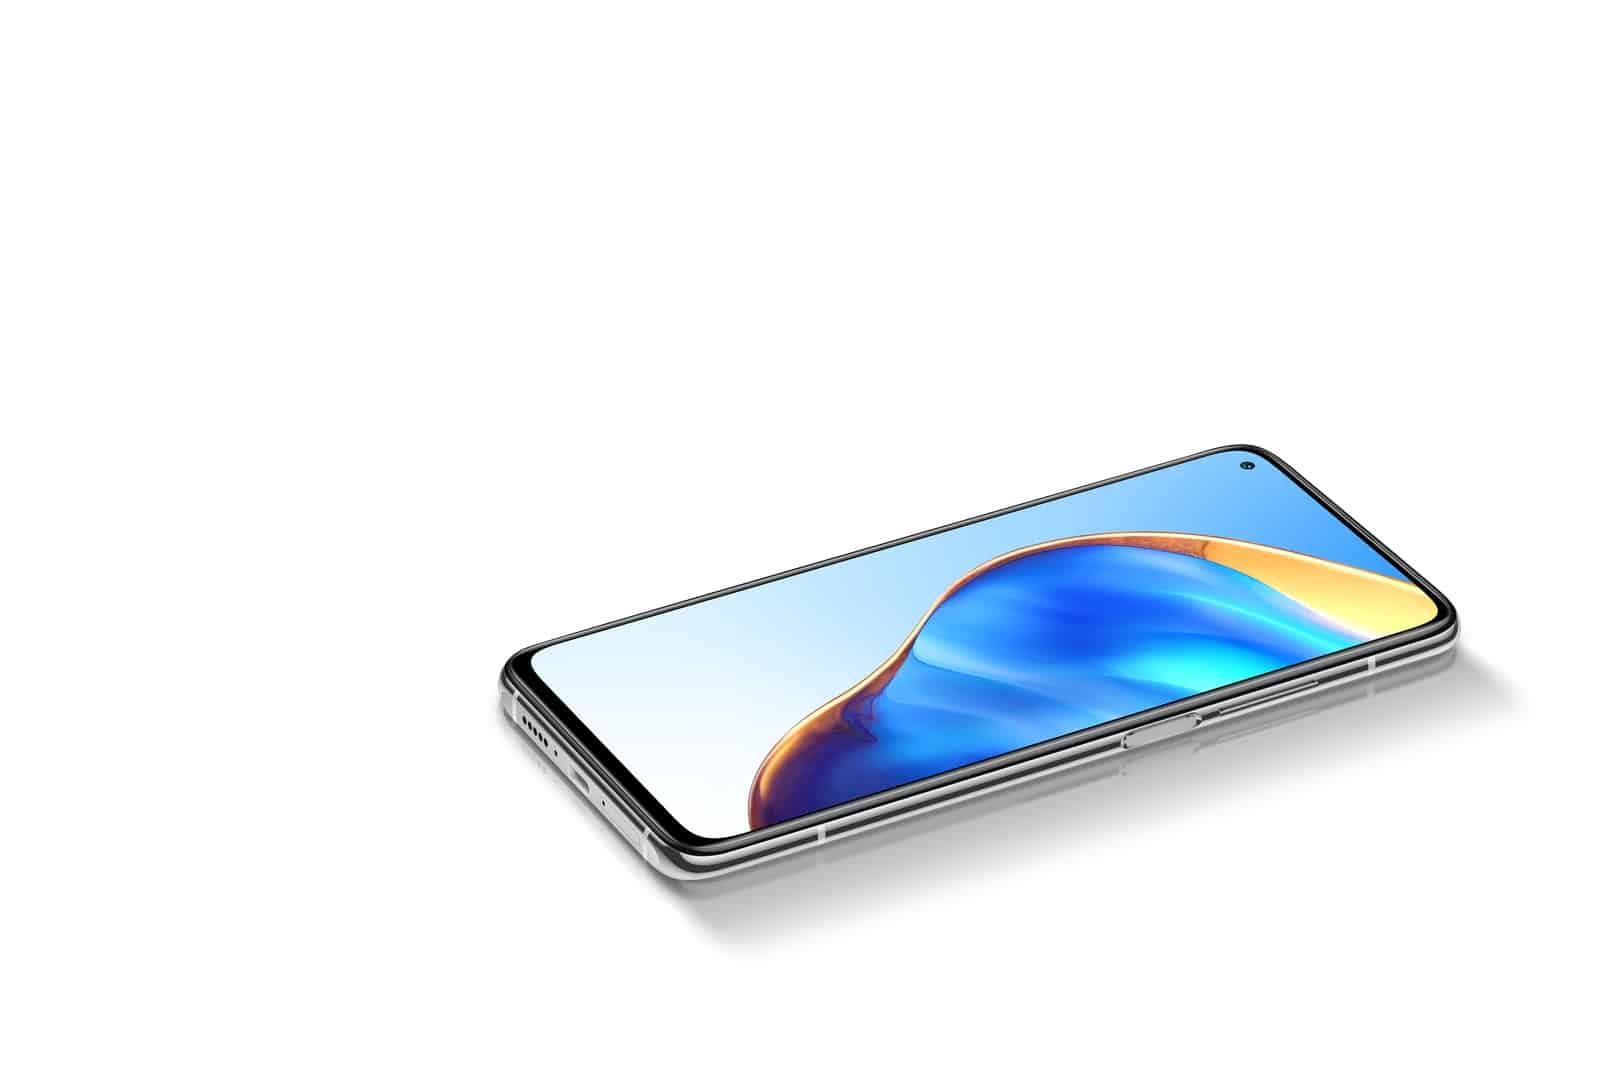 Xiaomi Mi 10T Pro image 12